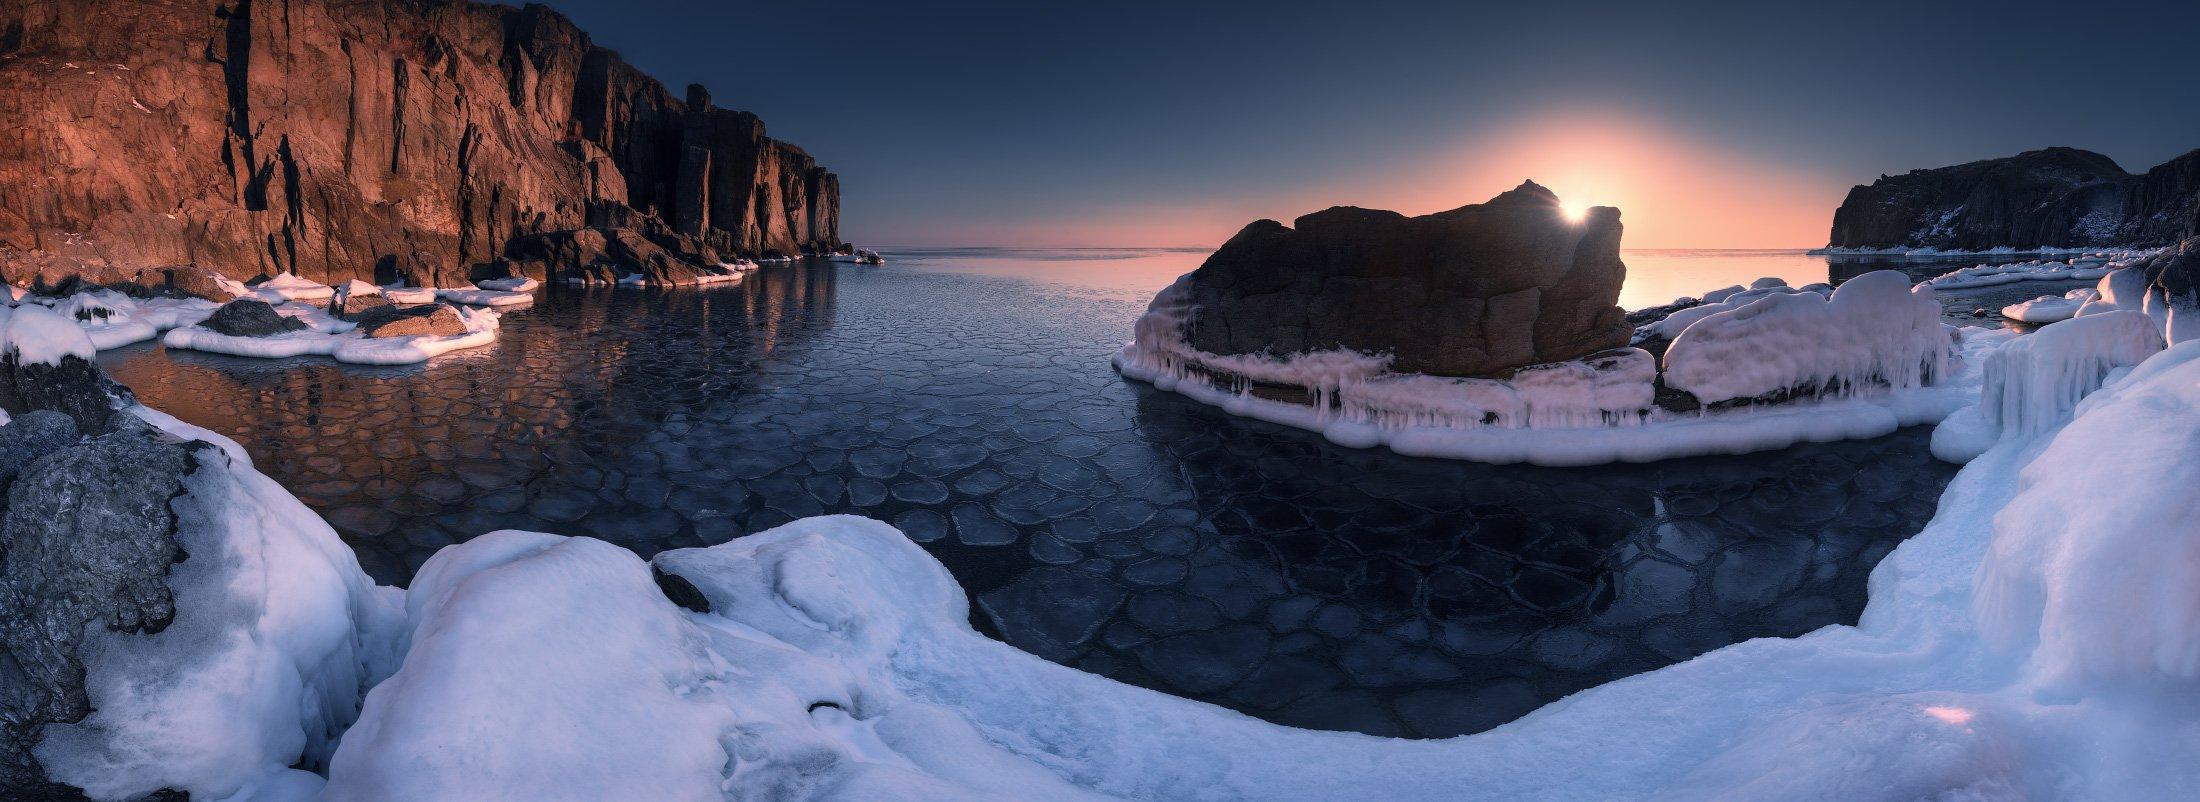 панорама, утро, море, скалы, зима, Андрей Кровлин